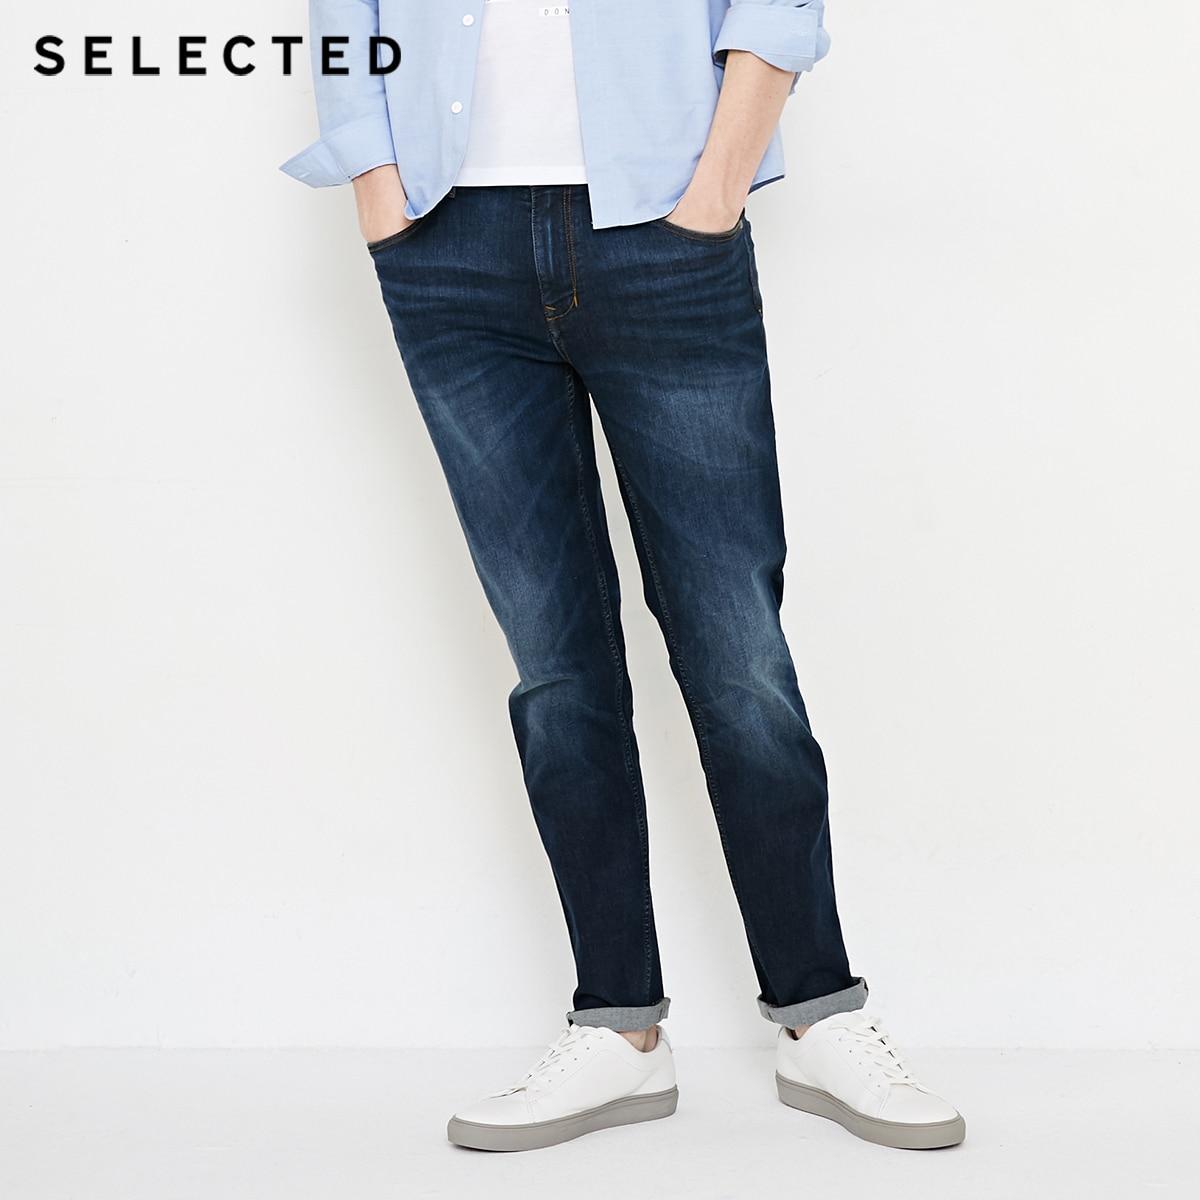 SELECTED New Elastic 3d Pleated Denim Pants Casual Men's   Jeans   C|418332510